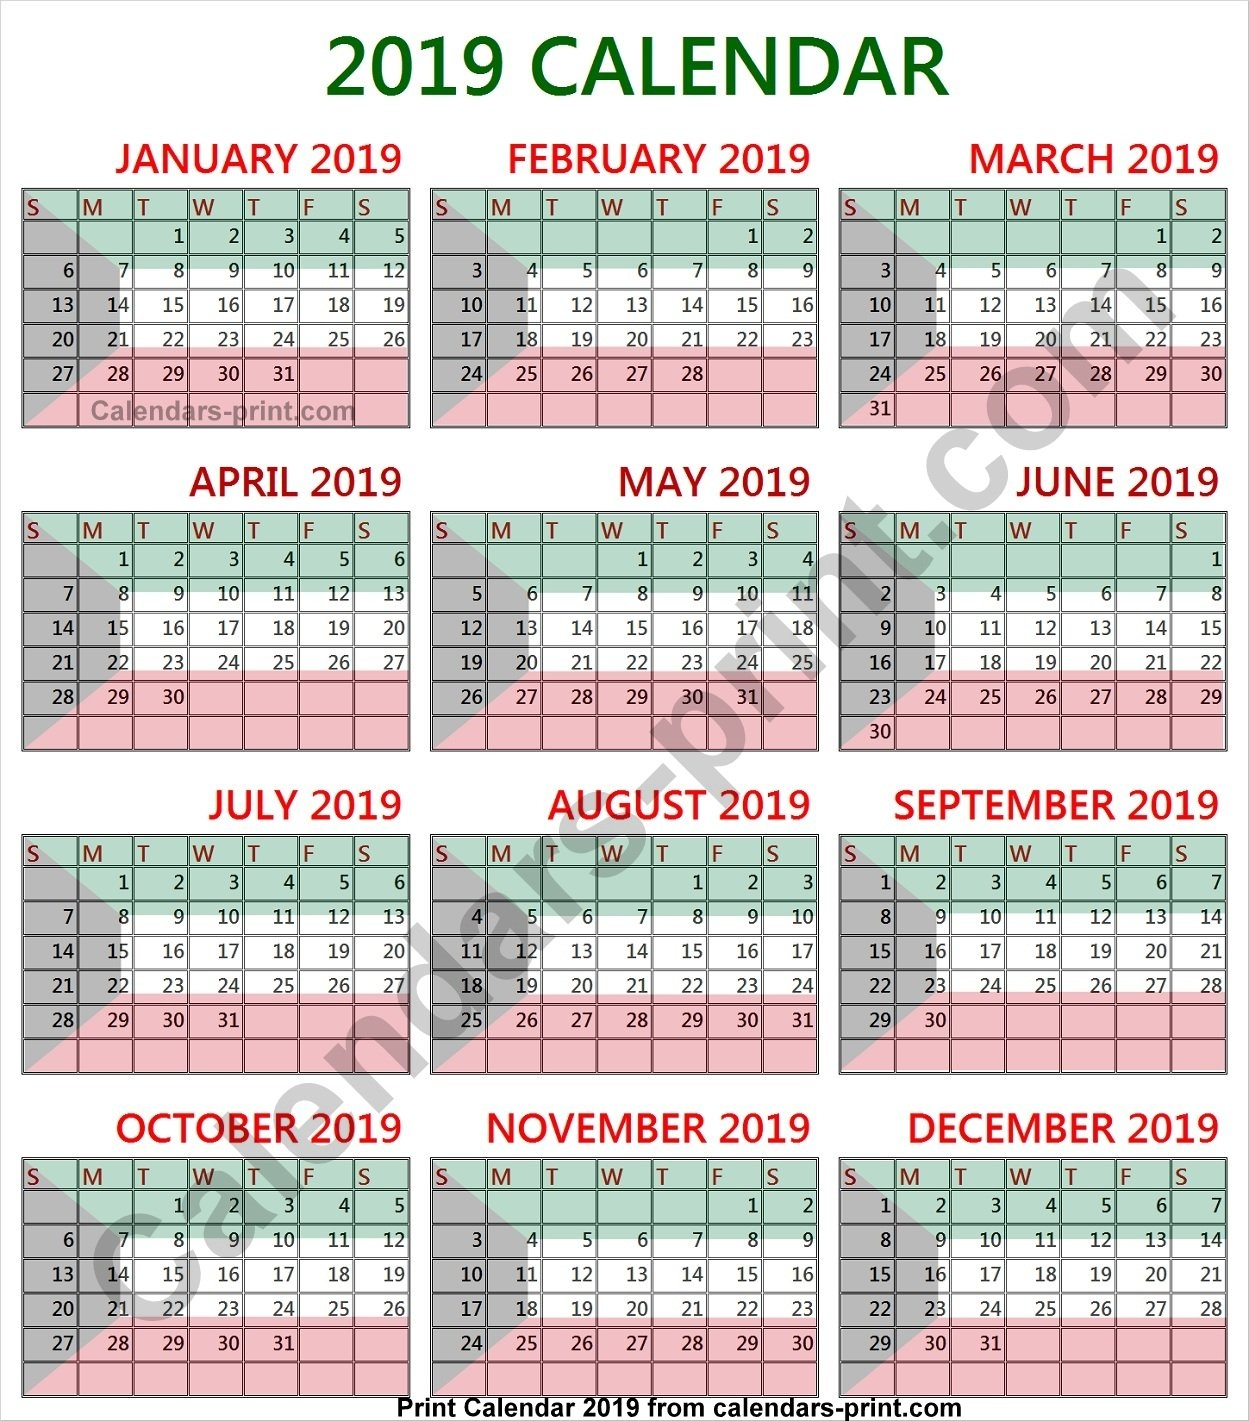 2019 Calendar Kuwait To Print Free | Download Blank Pdf Template Calendar 2019 Kuwait